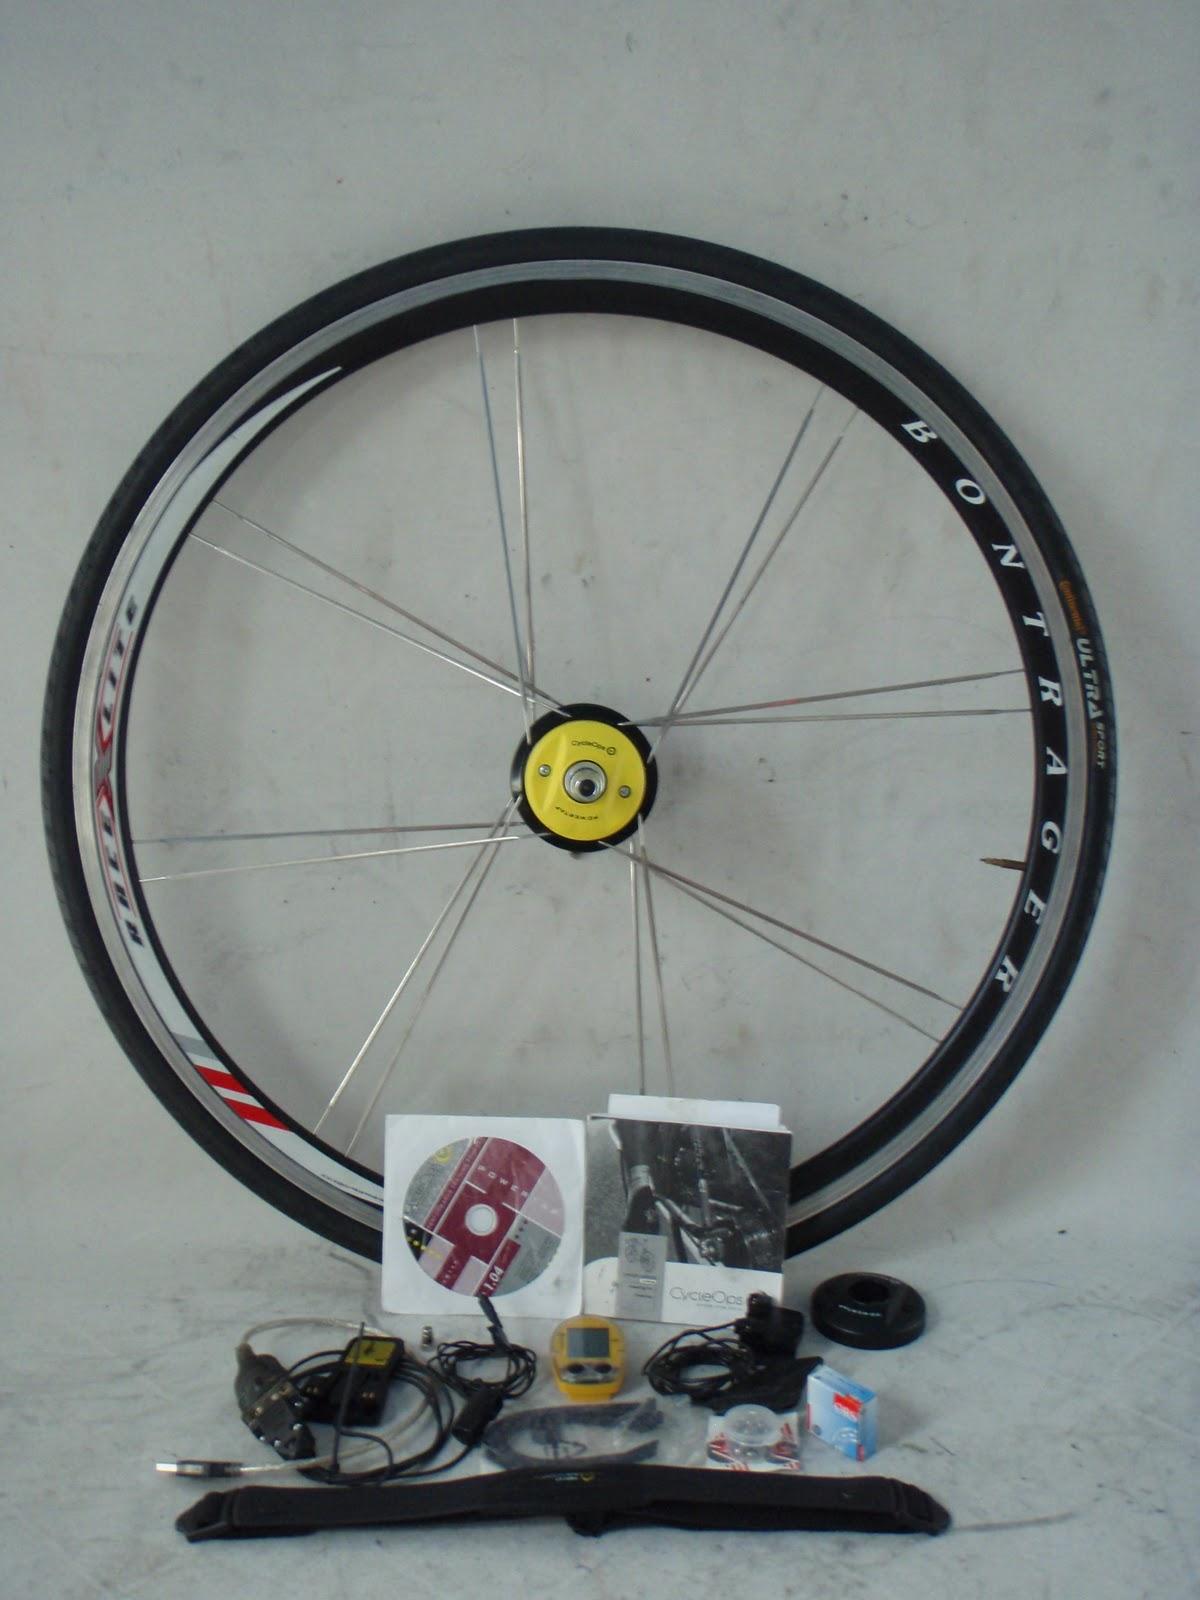 Saris Cycling Cycleops Powertap Rear HUB Bearing set Bicycle Ball Bearings